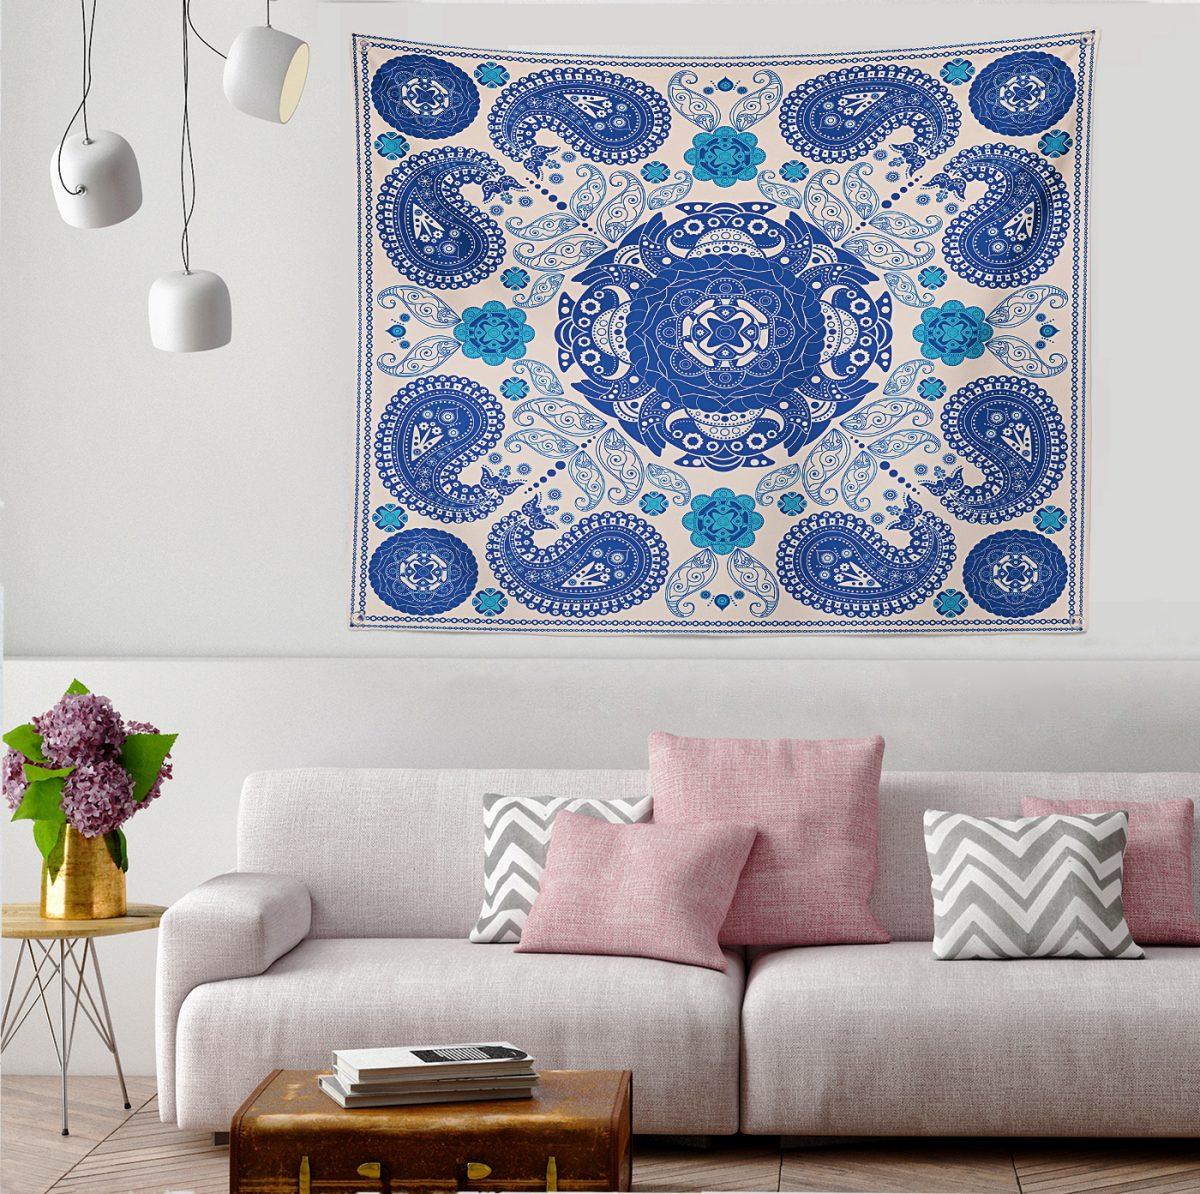 Realhomes Mavi Renkli Etnik Motifler Dijital Baskılı Tapestry Duvar Örtüsü Realhomes